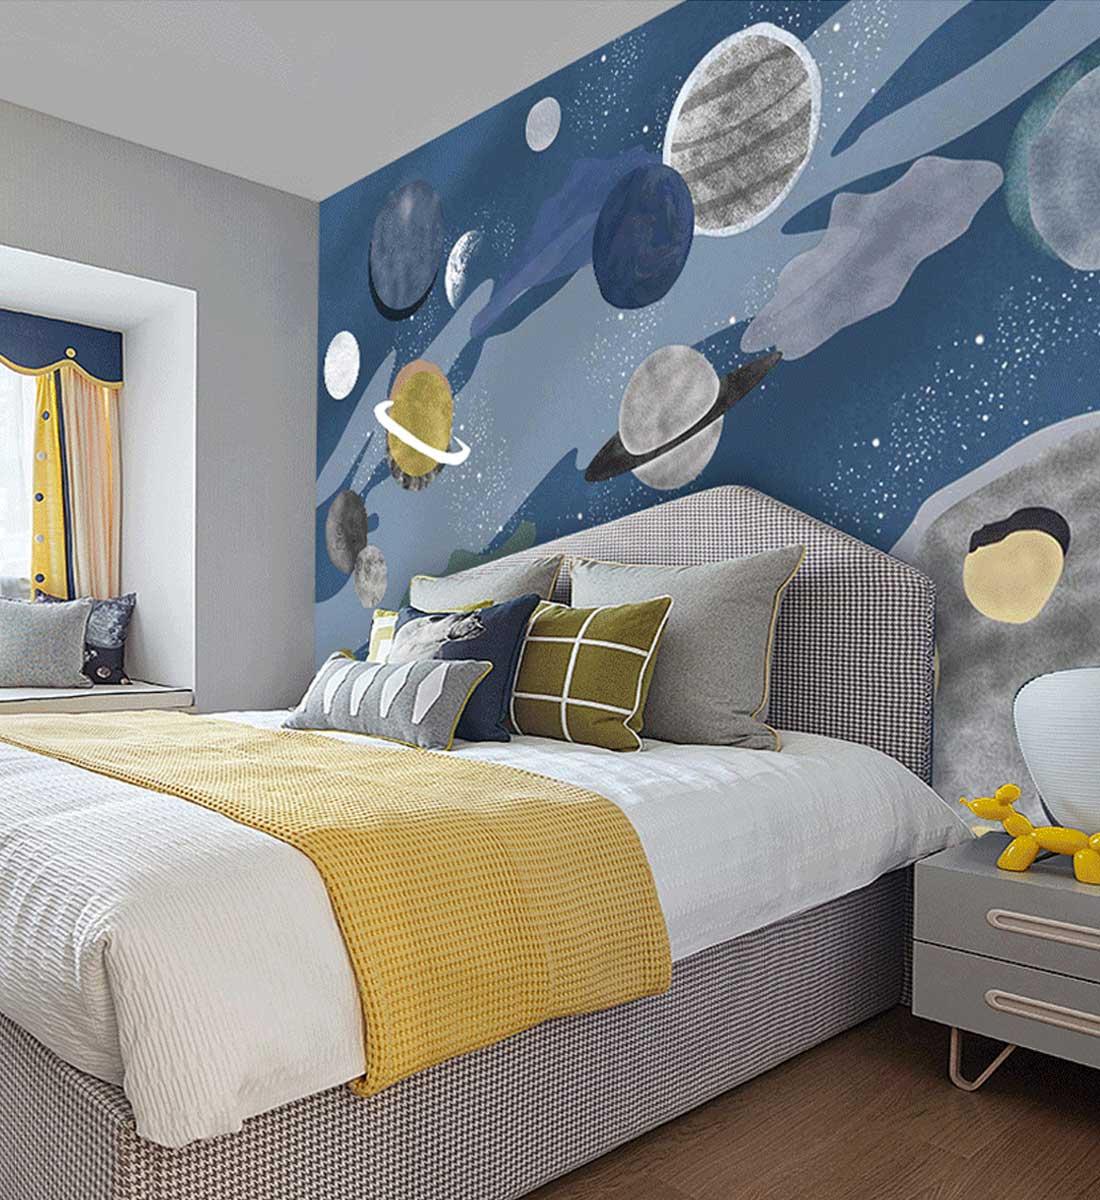 JCC天洋群星宇宙儿童房定制墙布